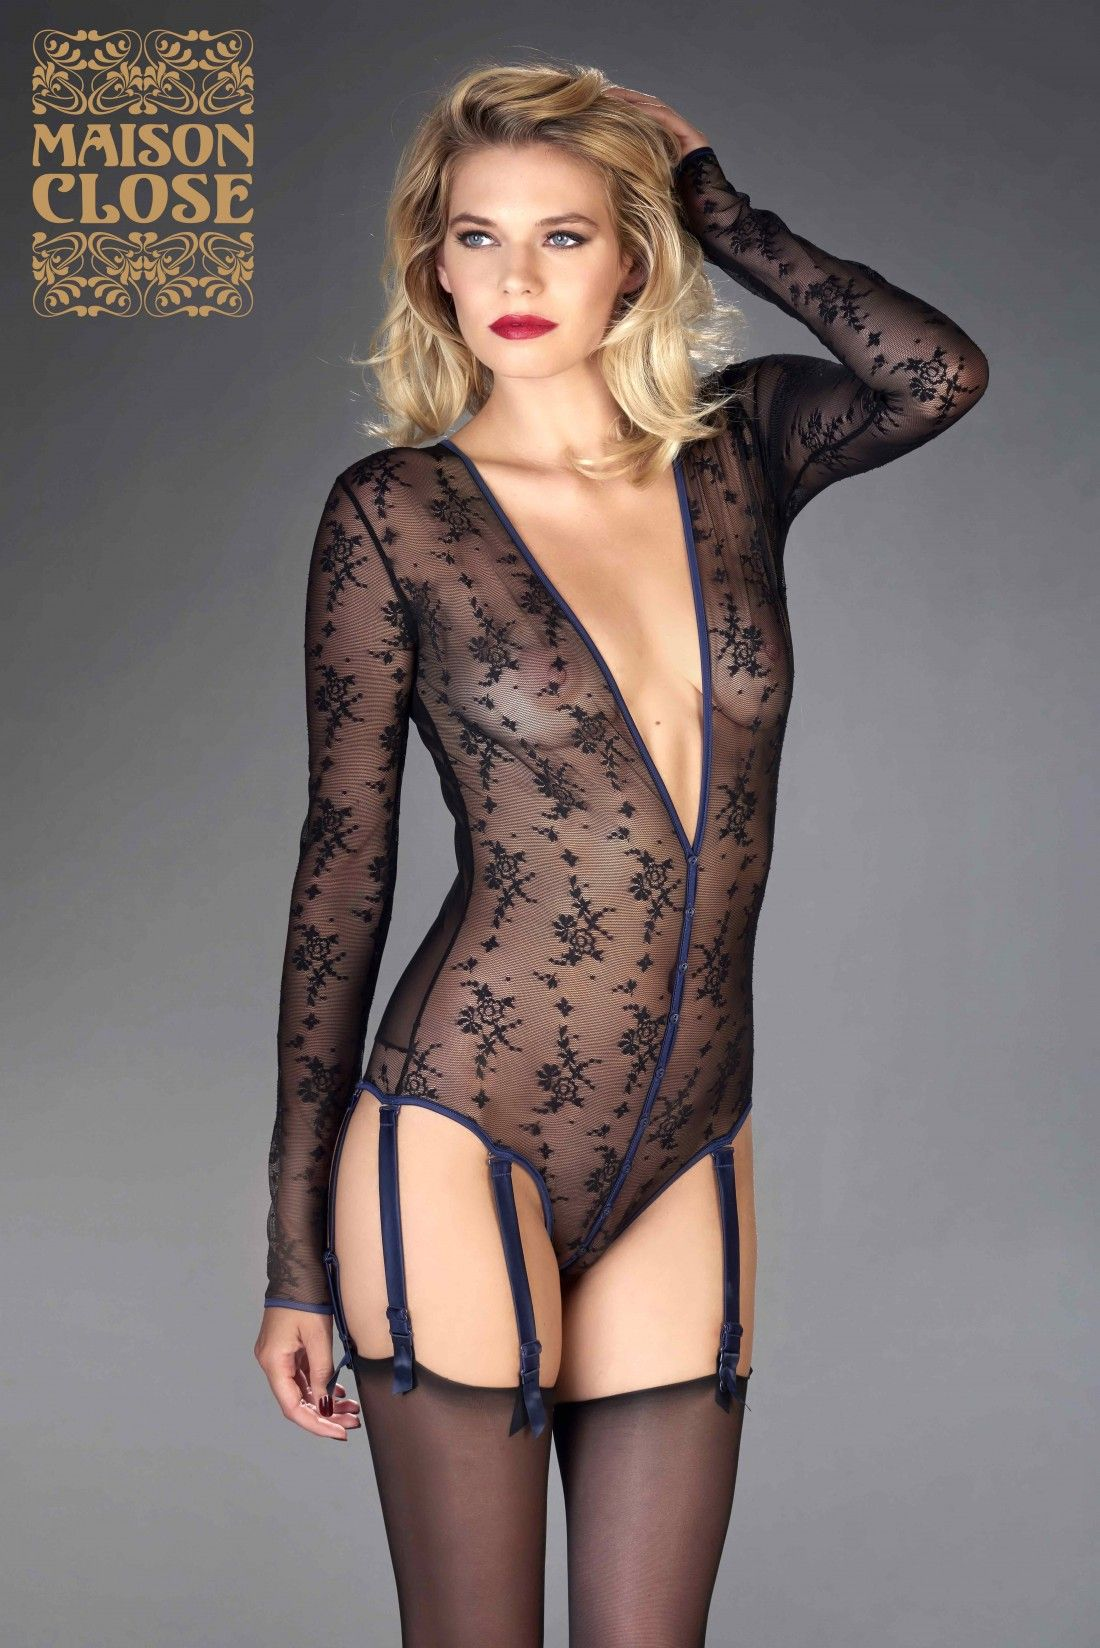 00d21564dc6 Tanga body - Vertige d Amour - Maison Close